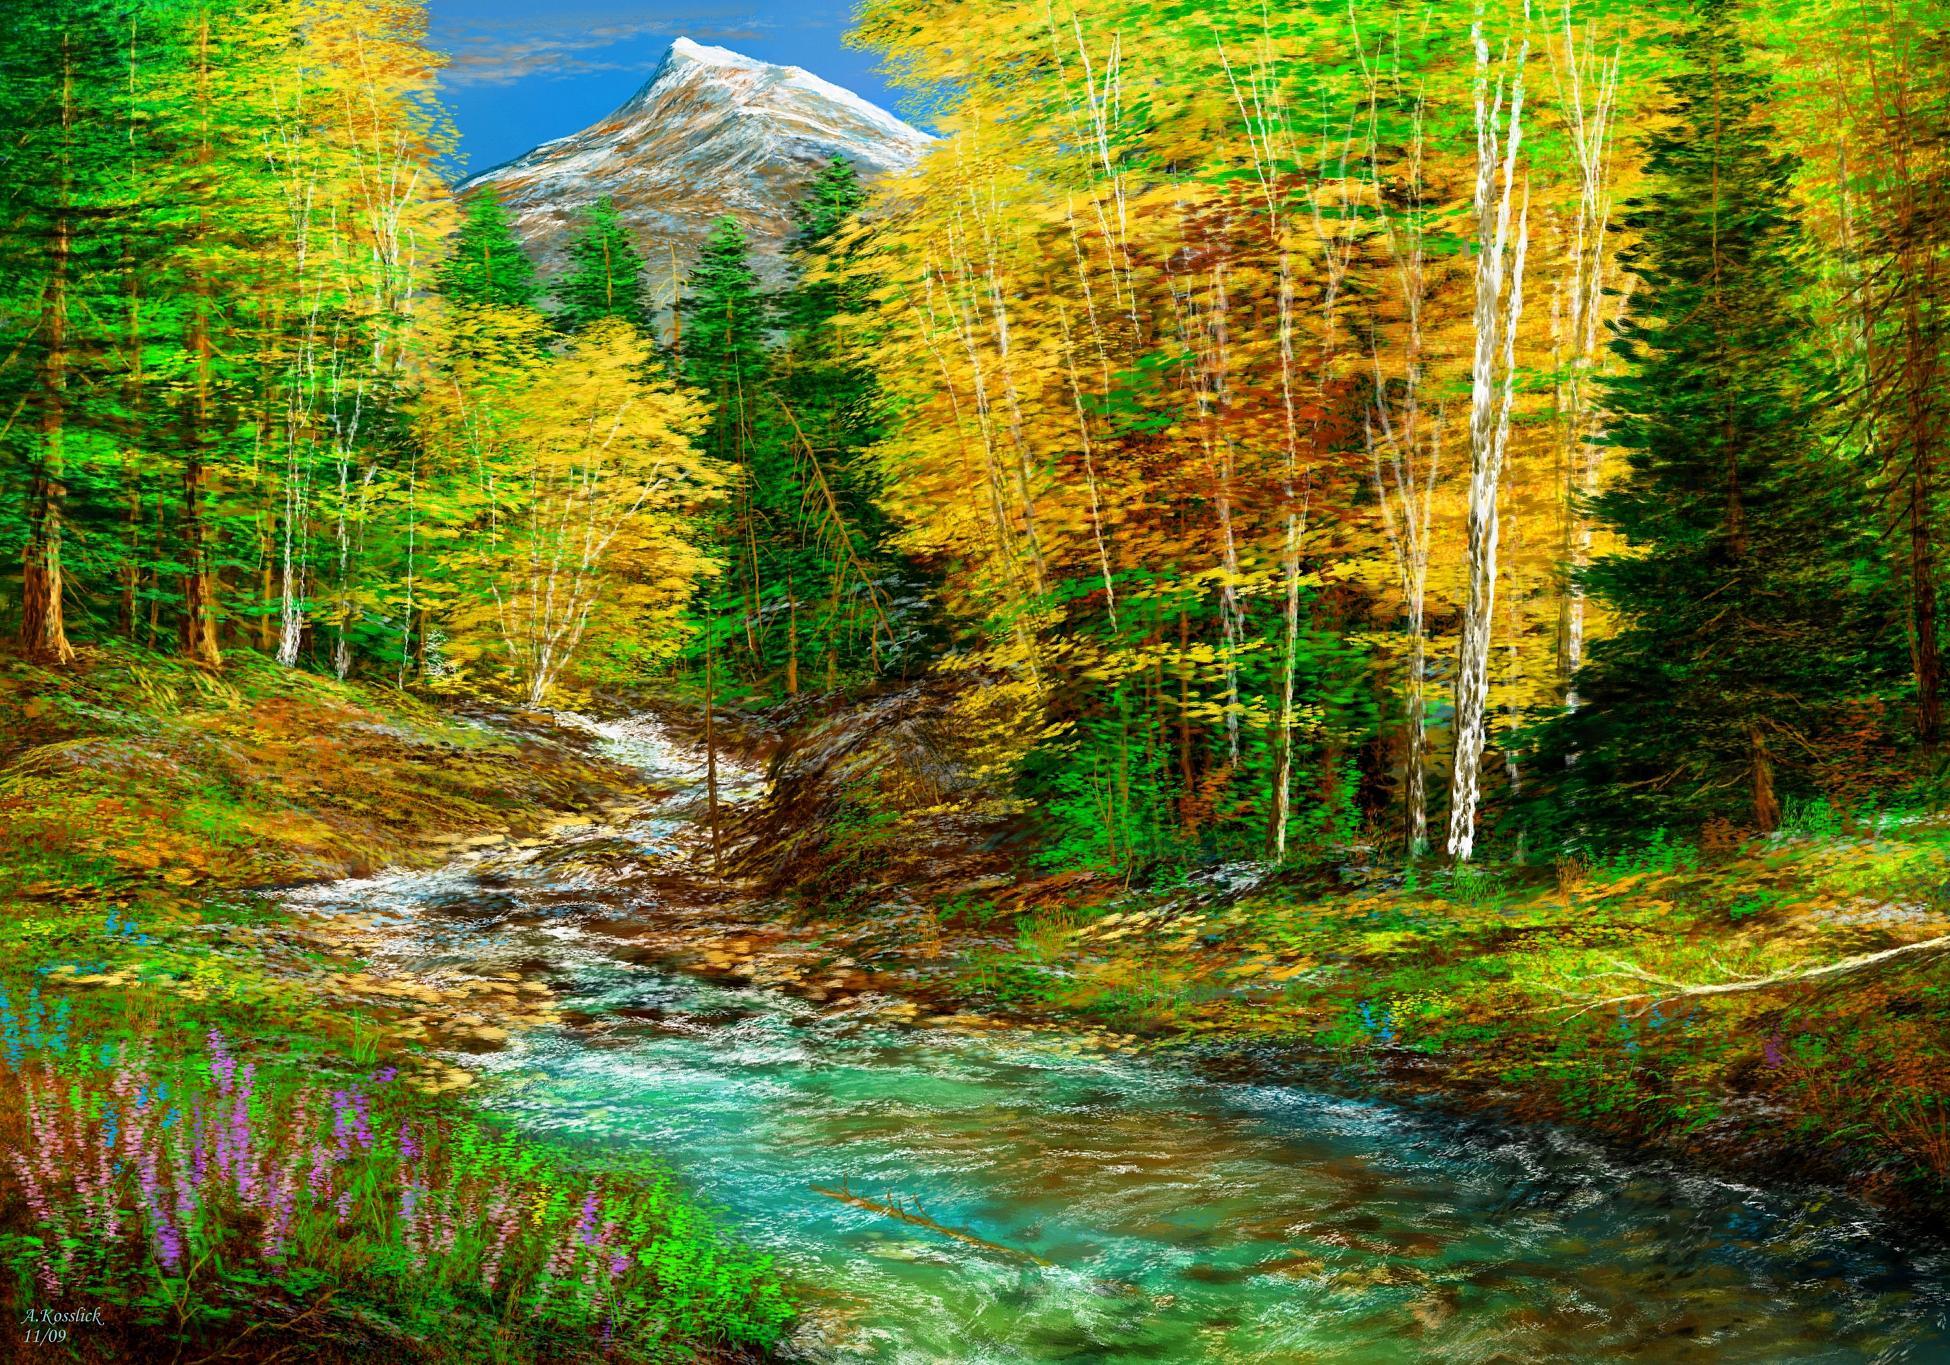 Aspen Tree Wallpaper For Home Wallpapersafari HD Wallpapers Download Free Images Wallpaper [1000image.com]